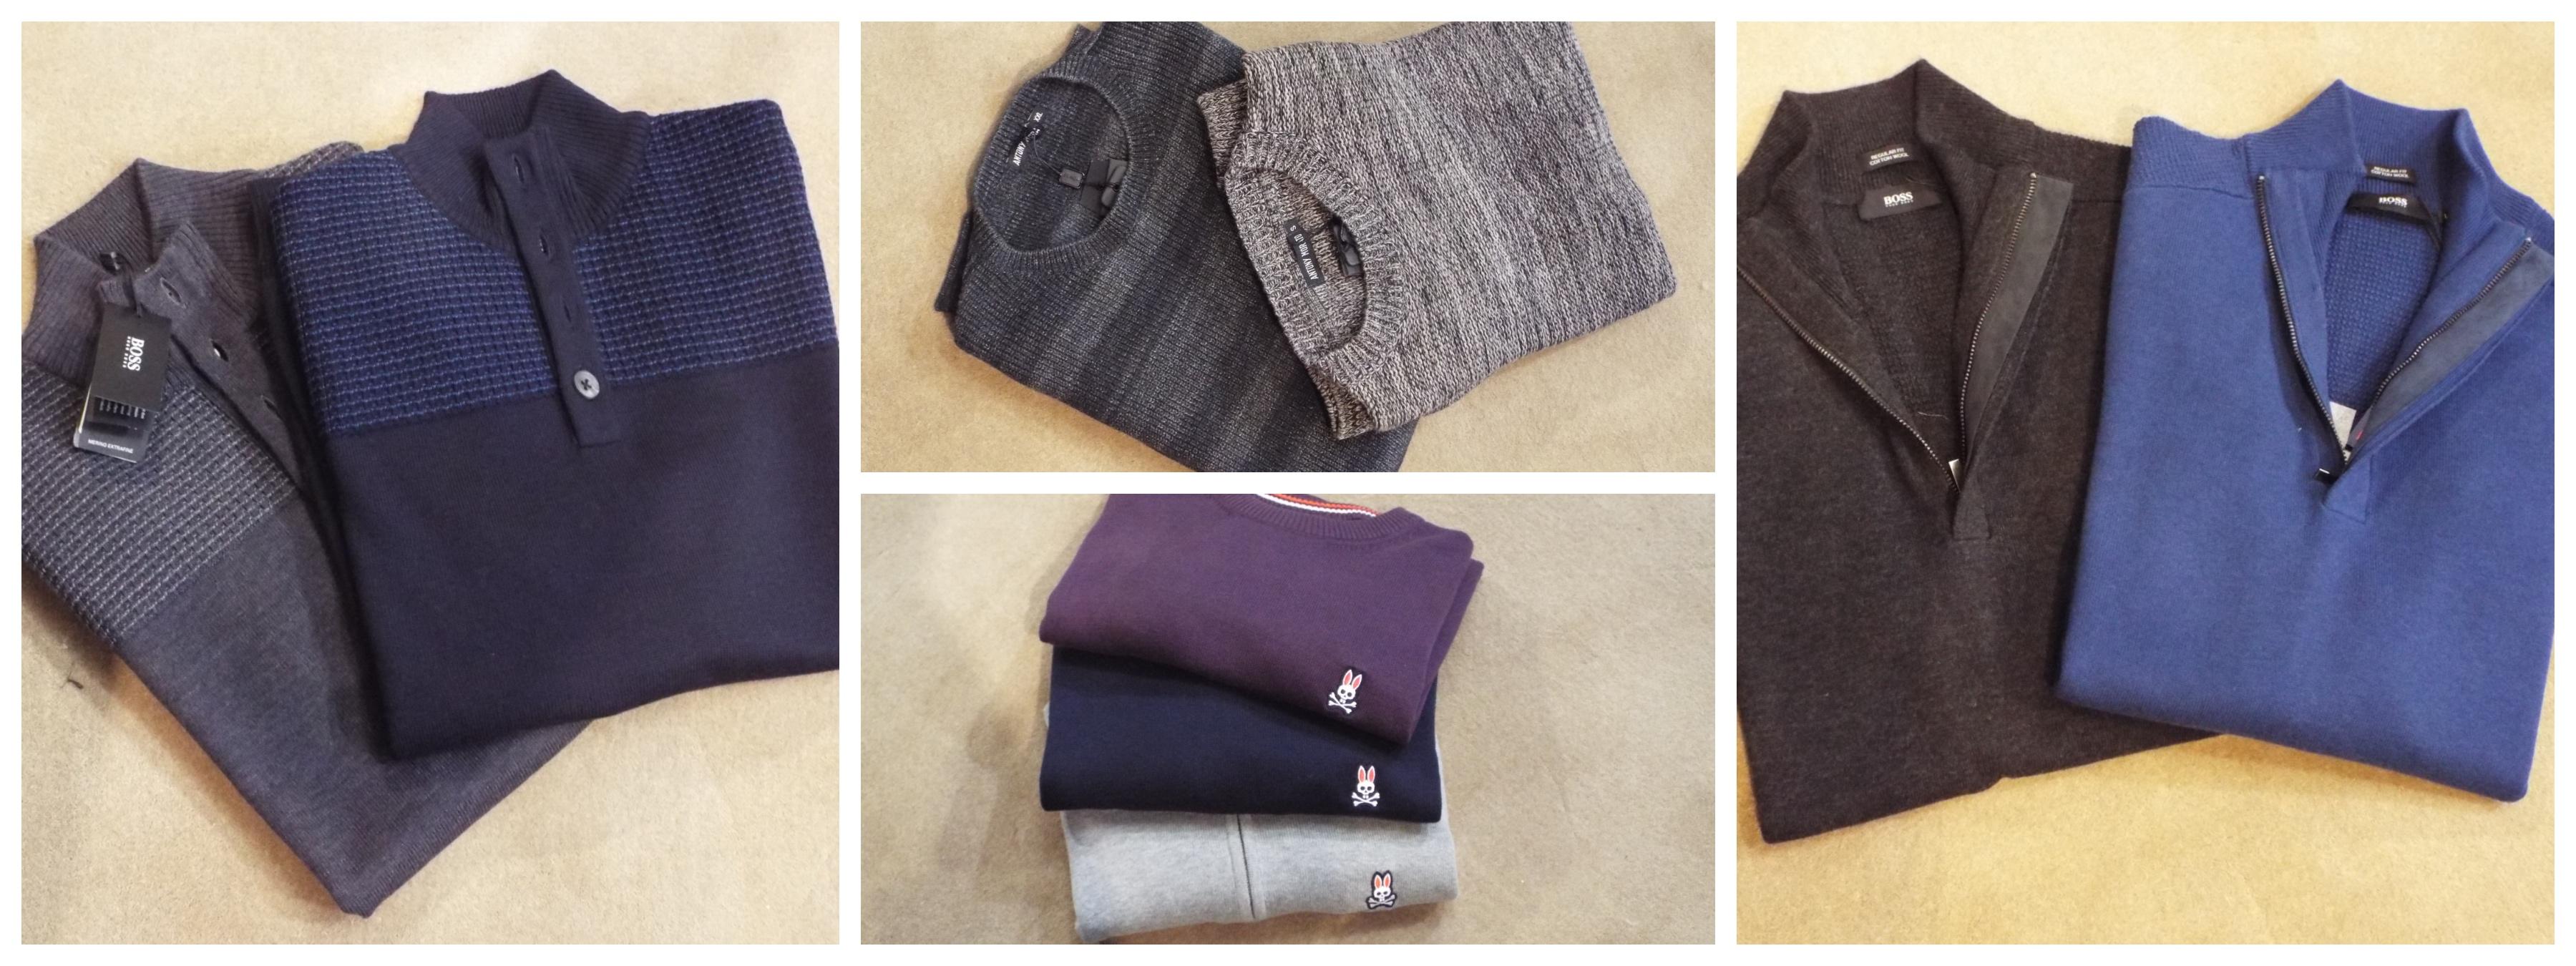 Knitwear collage